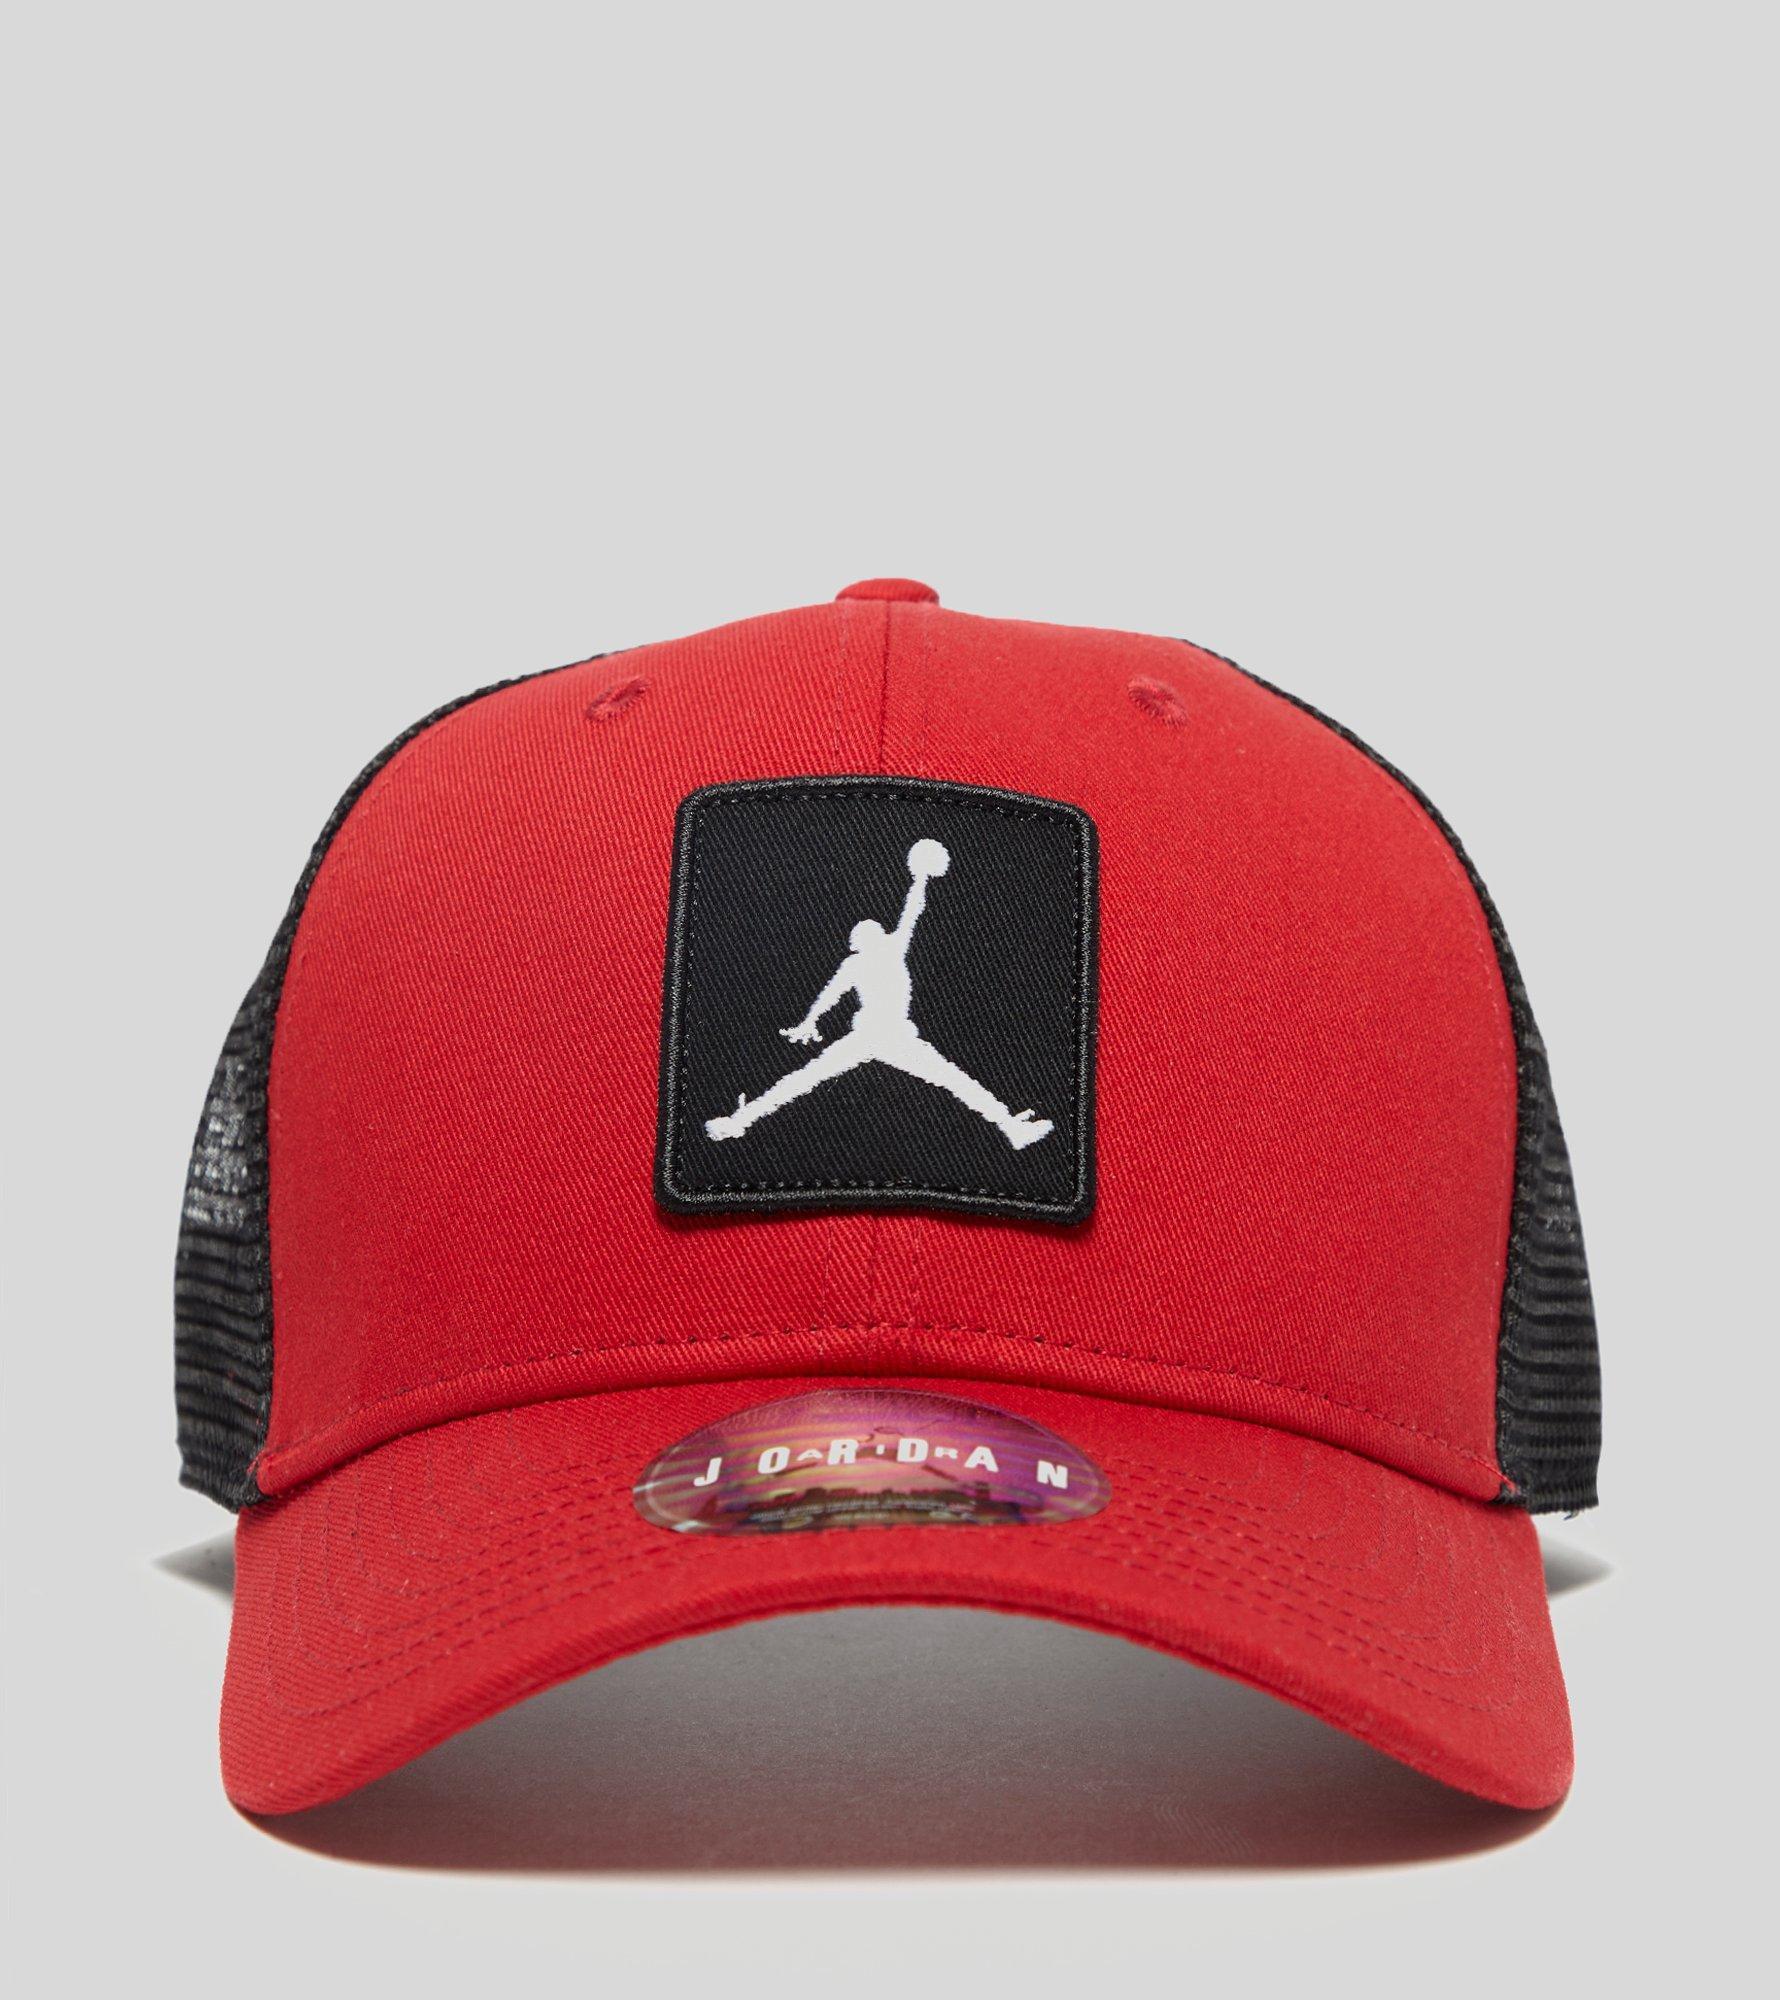 Lyst - Nike Jumpman Classic99 Trucker Cap in Red for Men 73d0c056c22